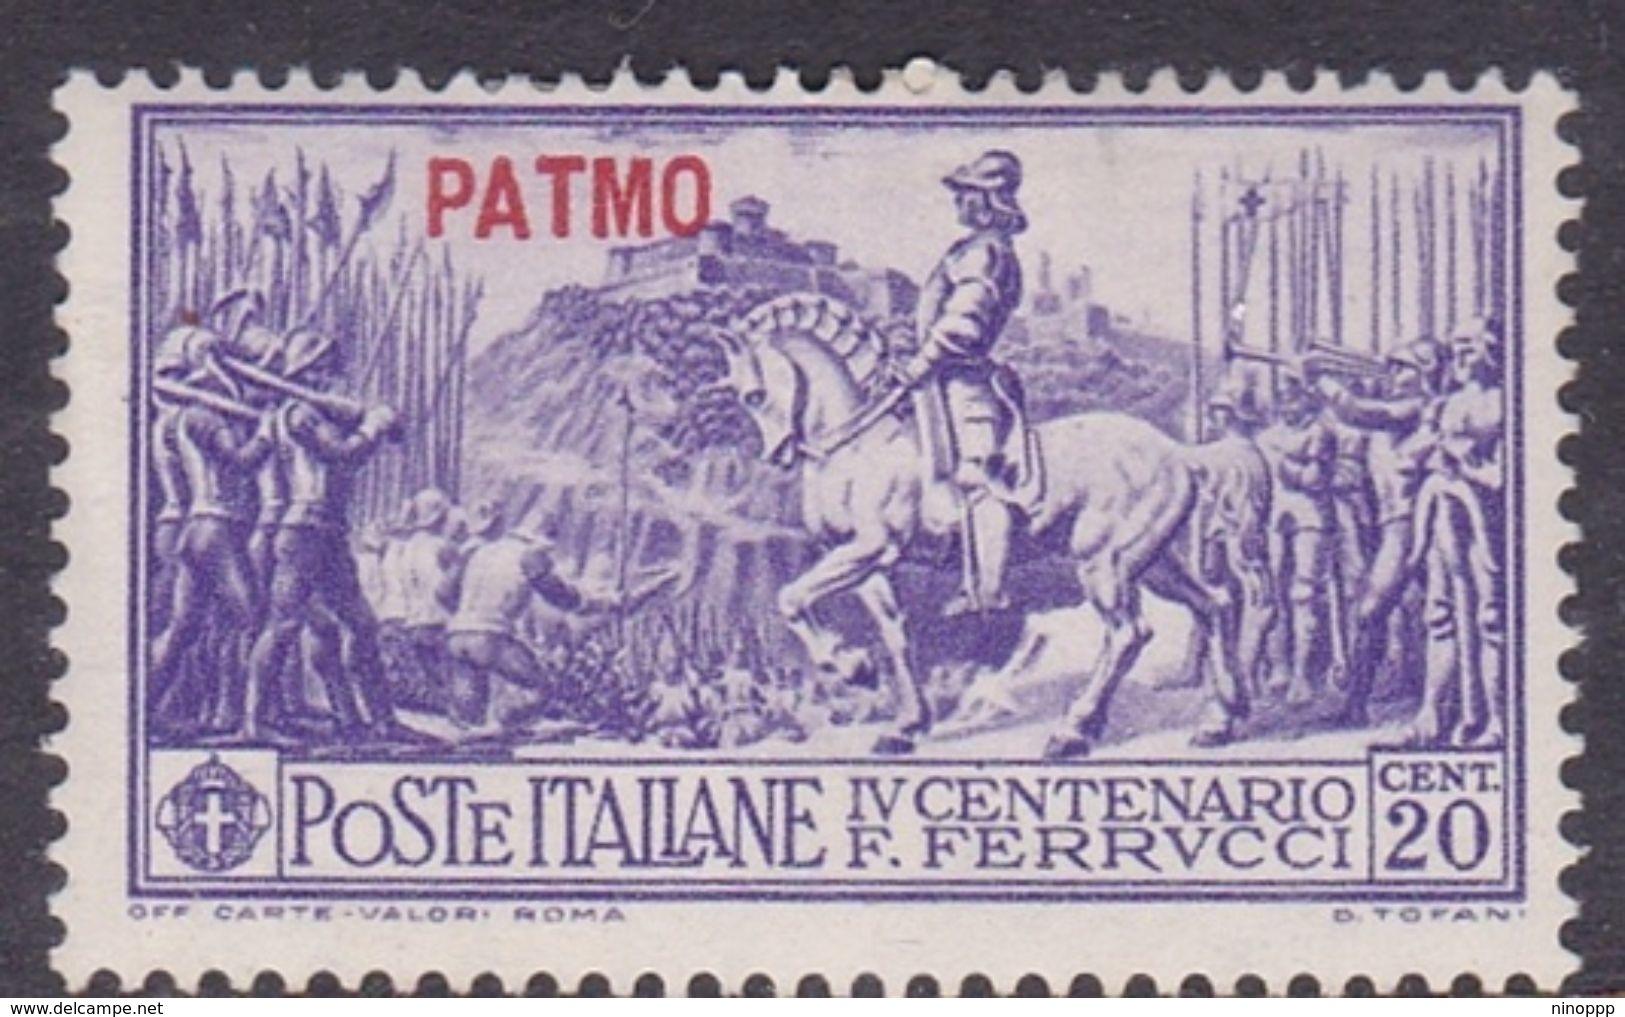 Italy-Colonies And Territories-Aegean-Patmo S 12 1930 Ferrucci 20c Violet MH - Egée (Patmo)